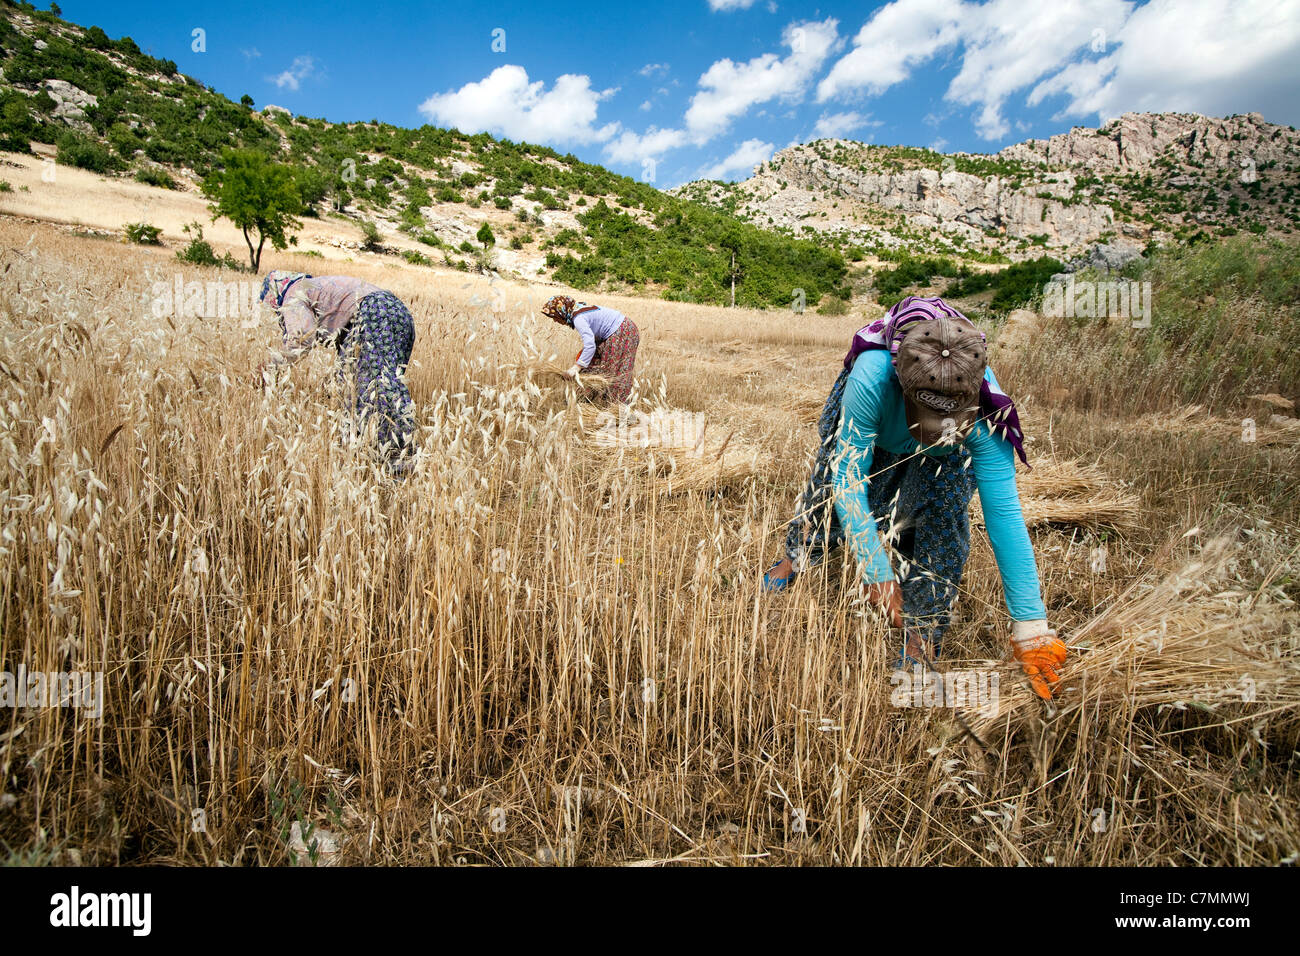 Le donne la raccolta di orzo in Antalya Gündoğmuş Turchia Immagini Stock